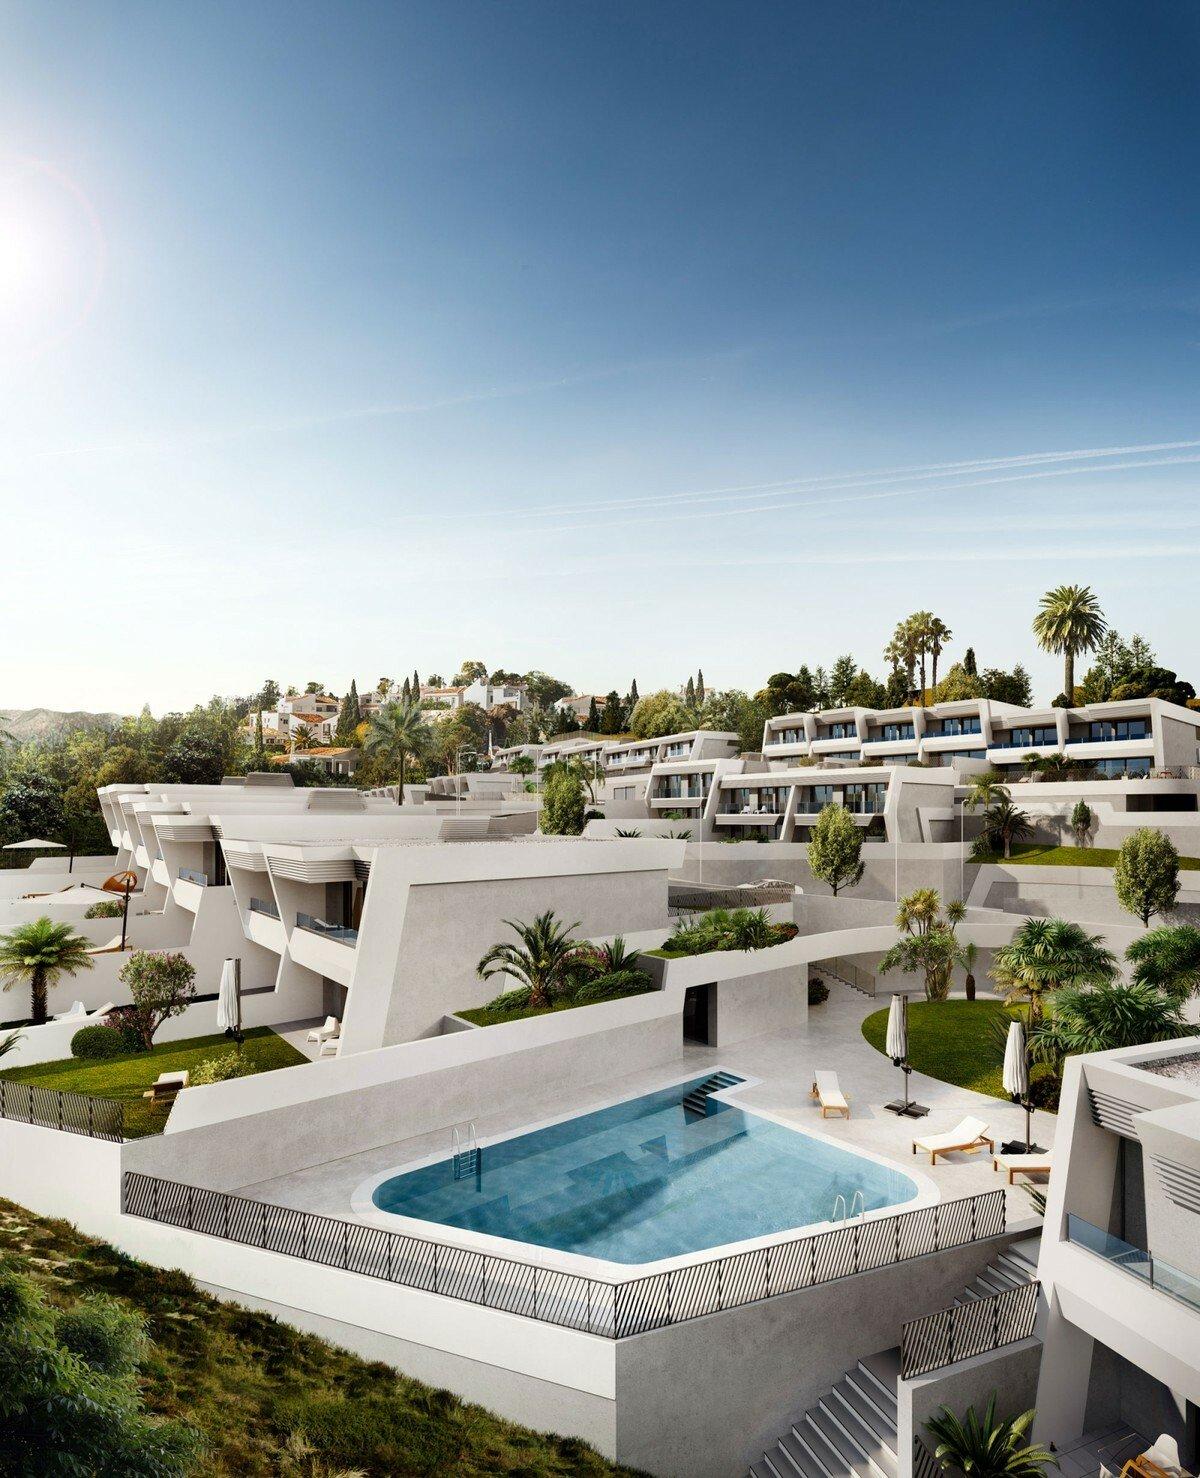 Appartamento a Cancelada, Andalusia, Spagna 1 - 11452292